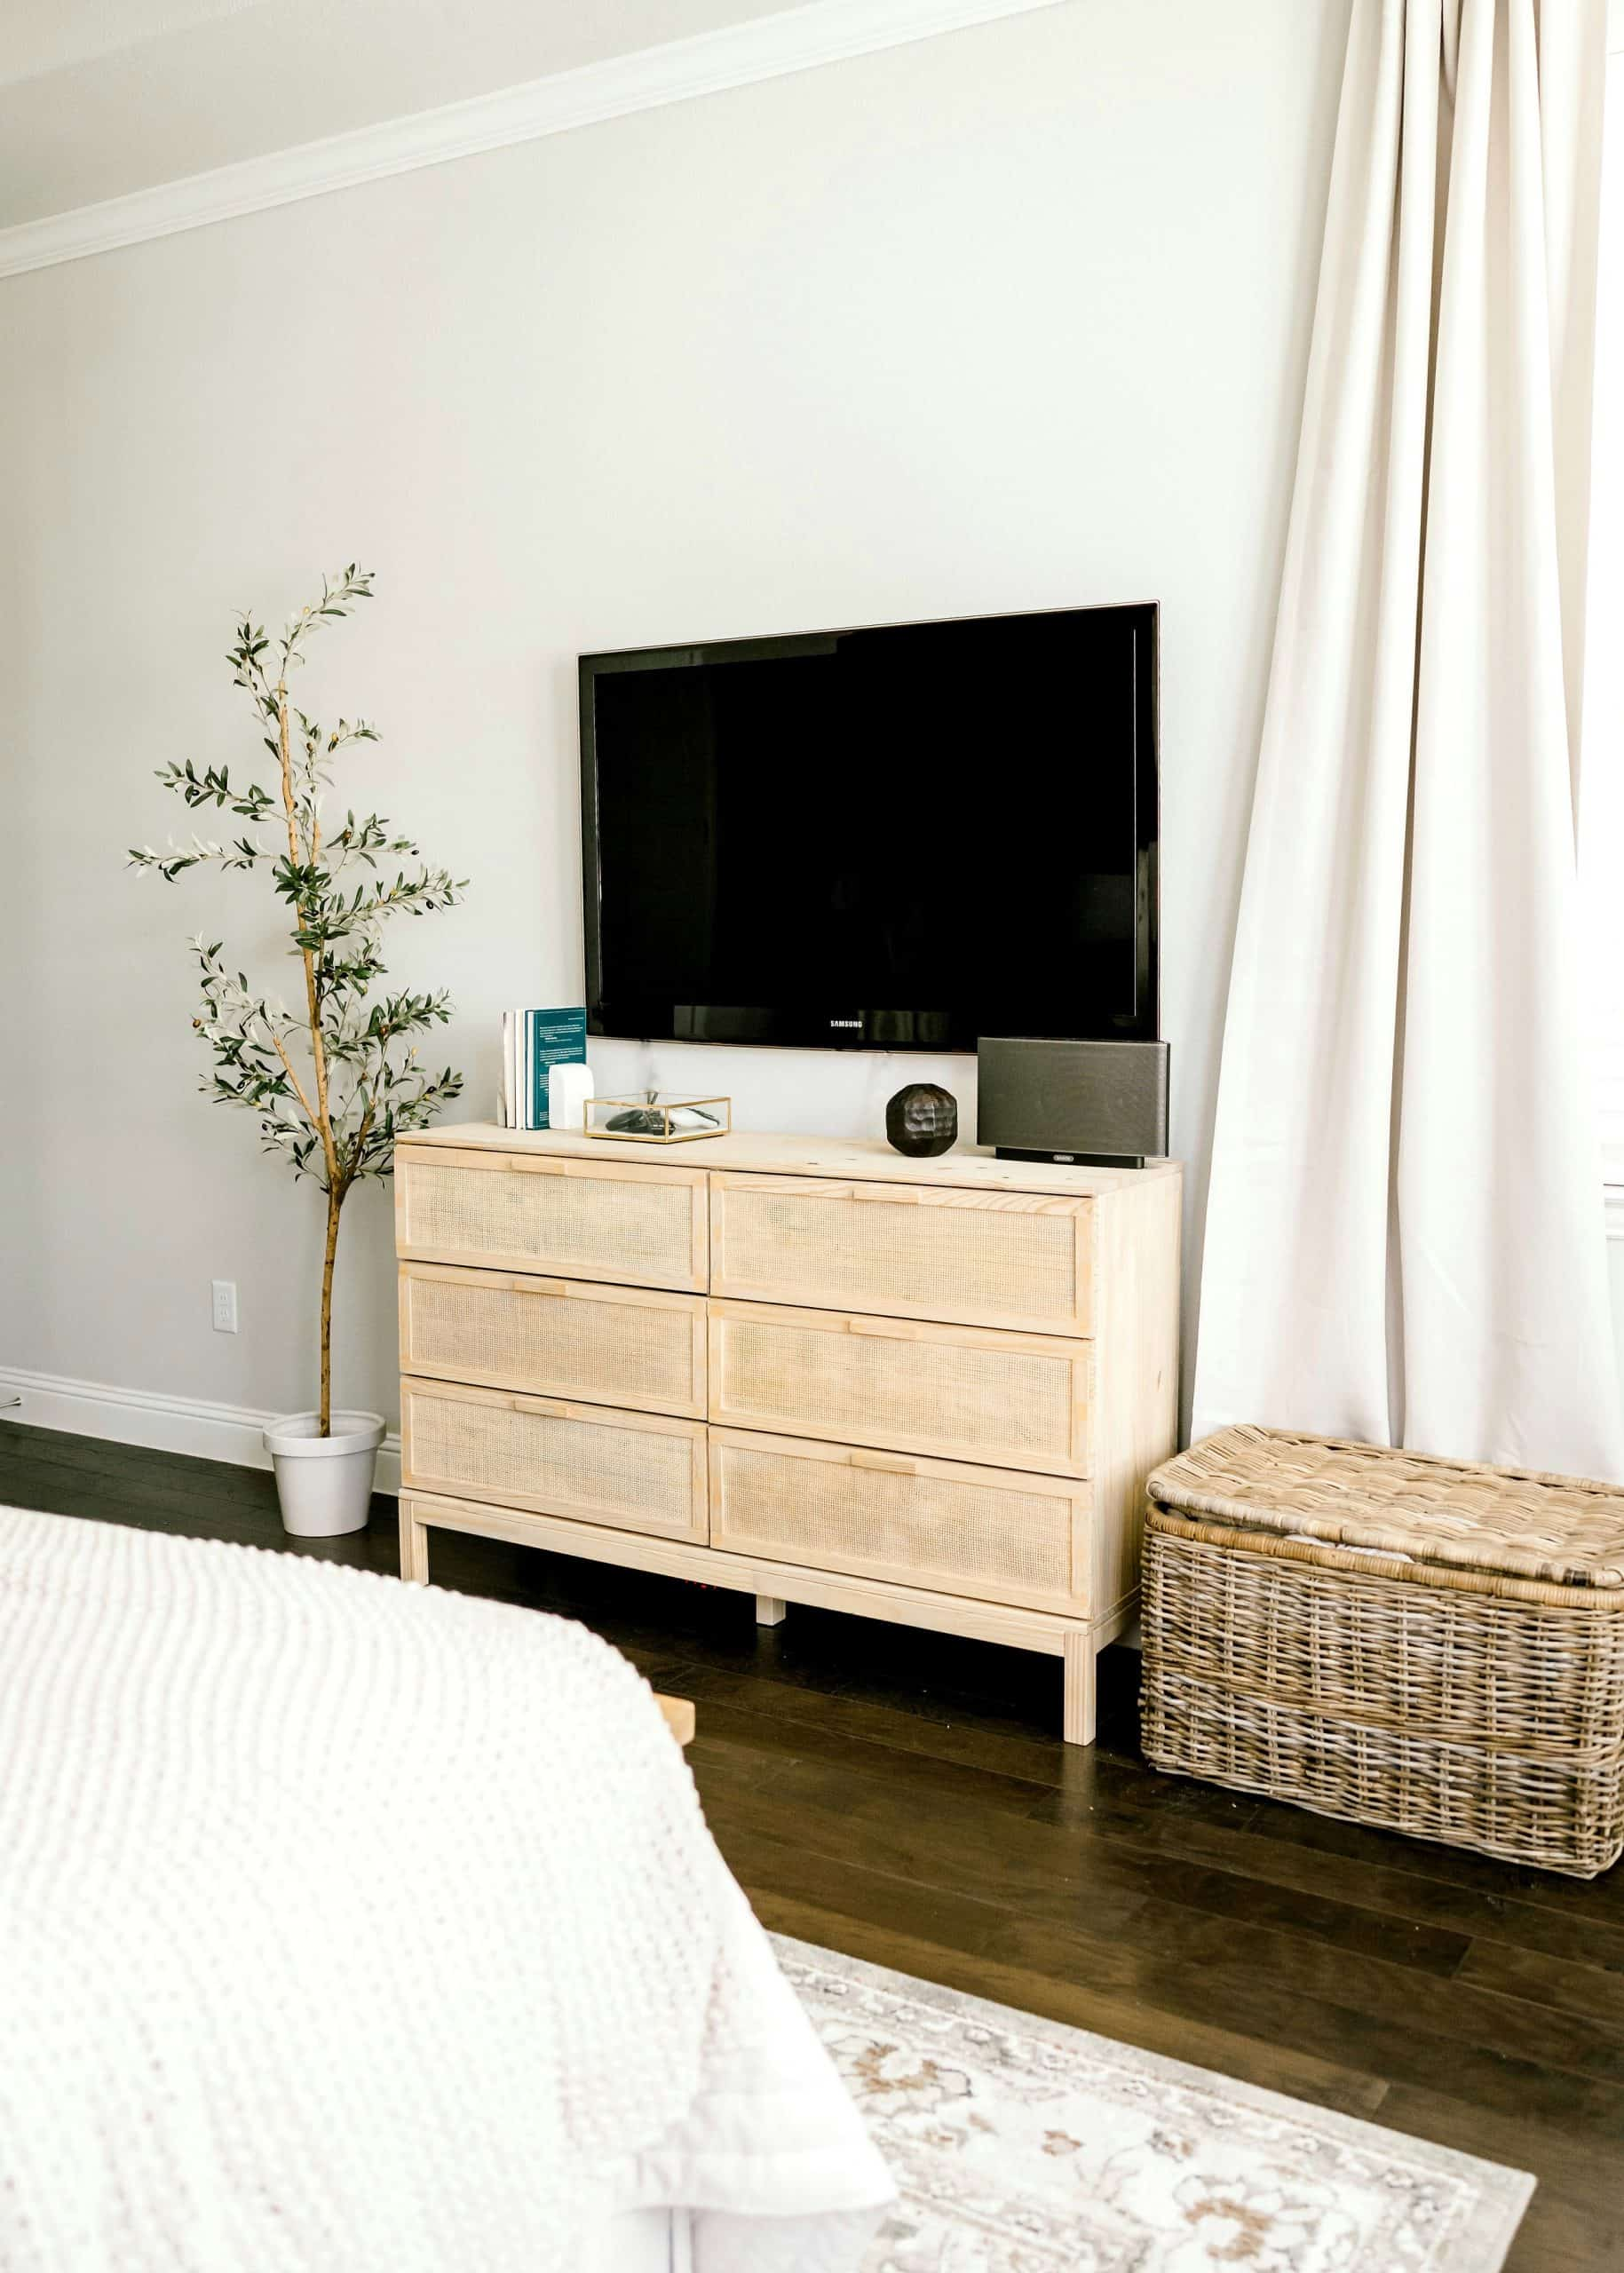 IKEA hack DIY cane dresser Reveal